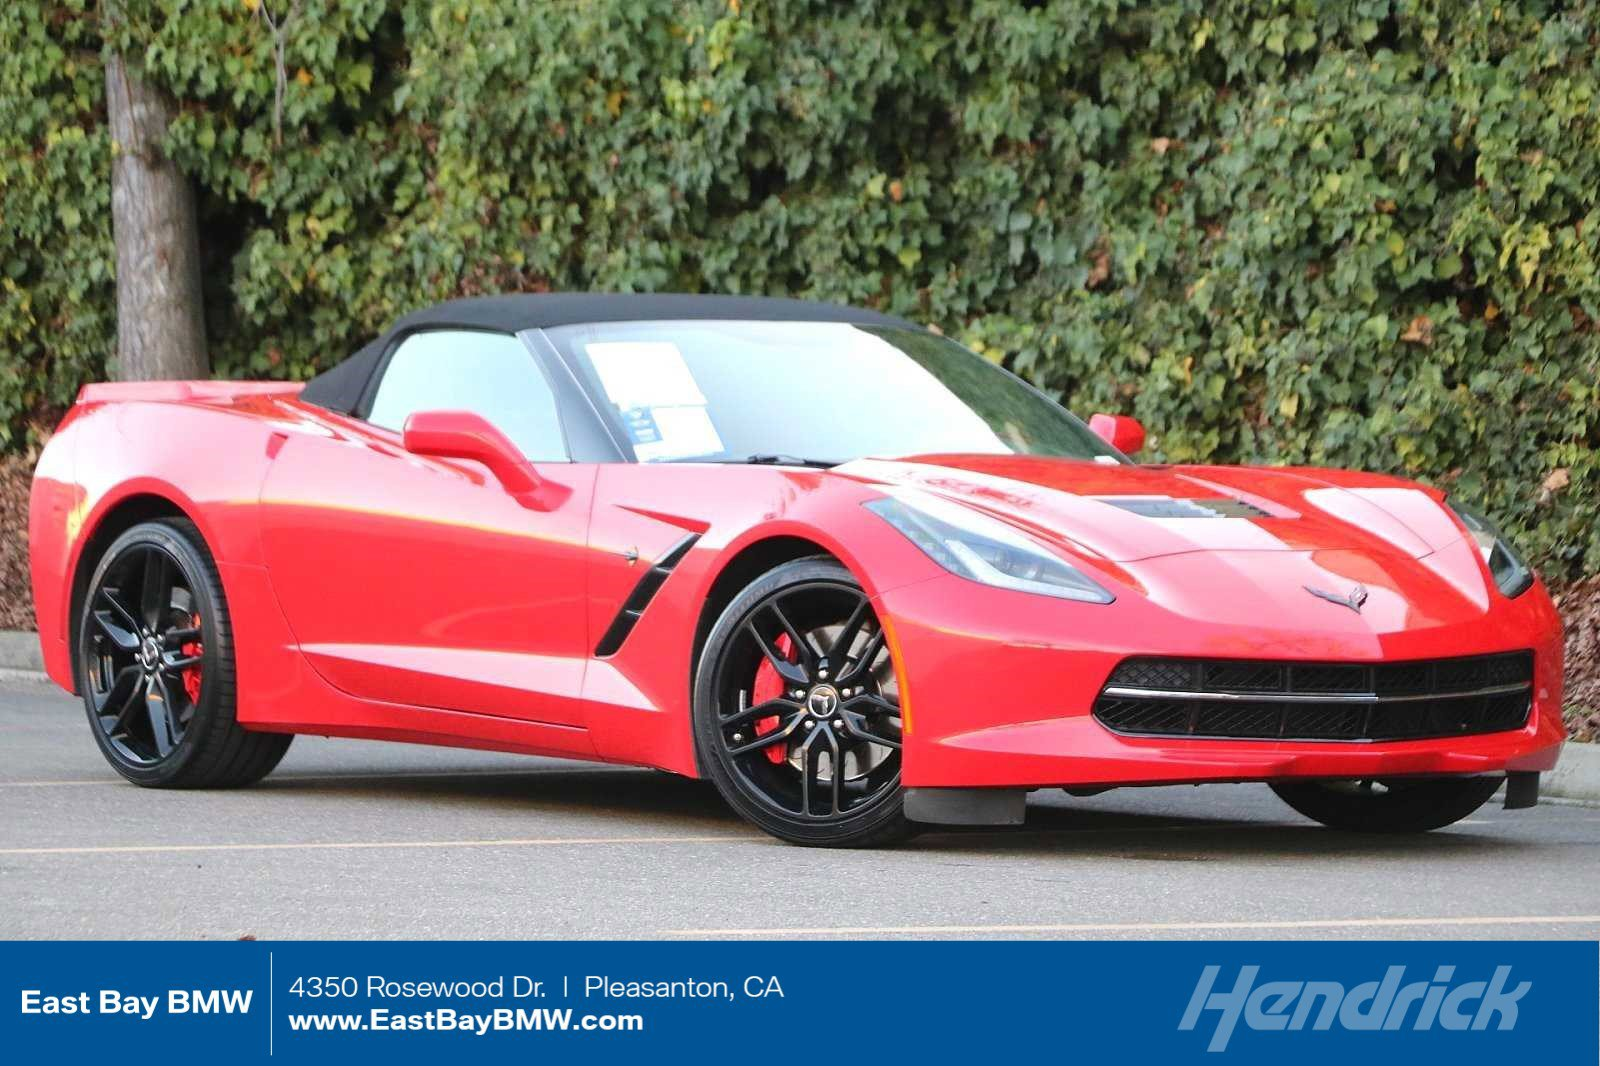 2015 Chevrolet Corvette Stingray Convertible image